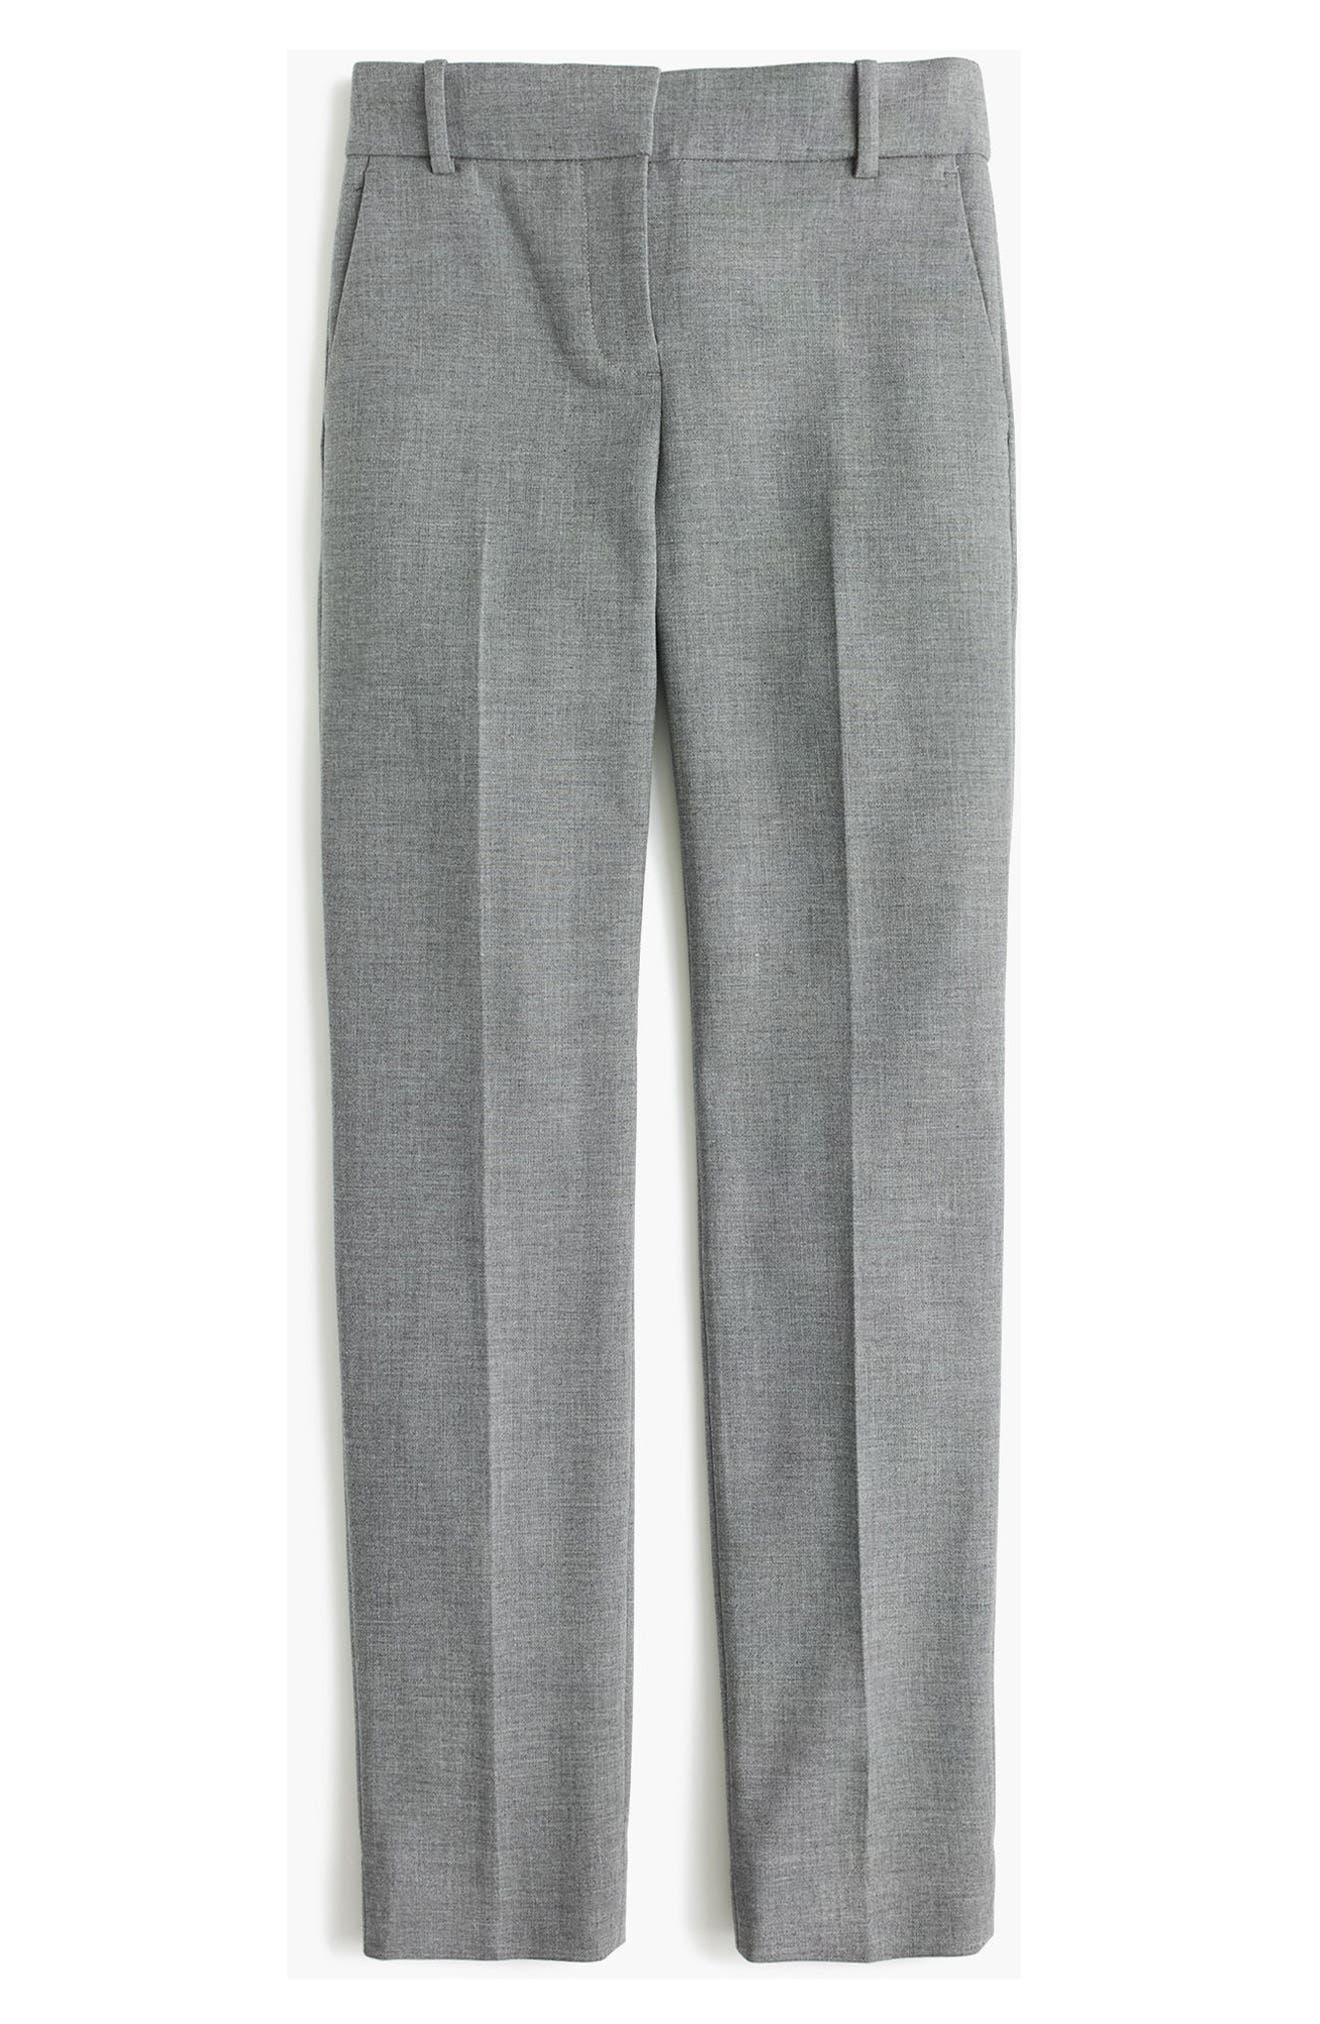 Cameron Four Season Crop Pants,                             Main thumbnail 1, color,                             HEATHER GRAPHITE